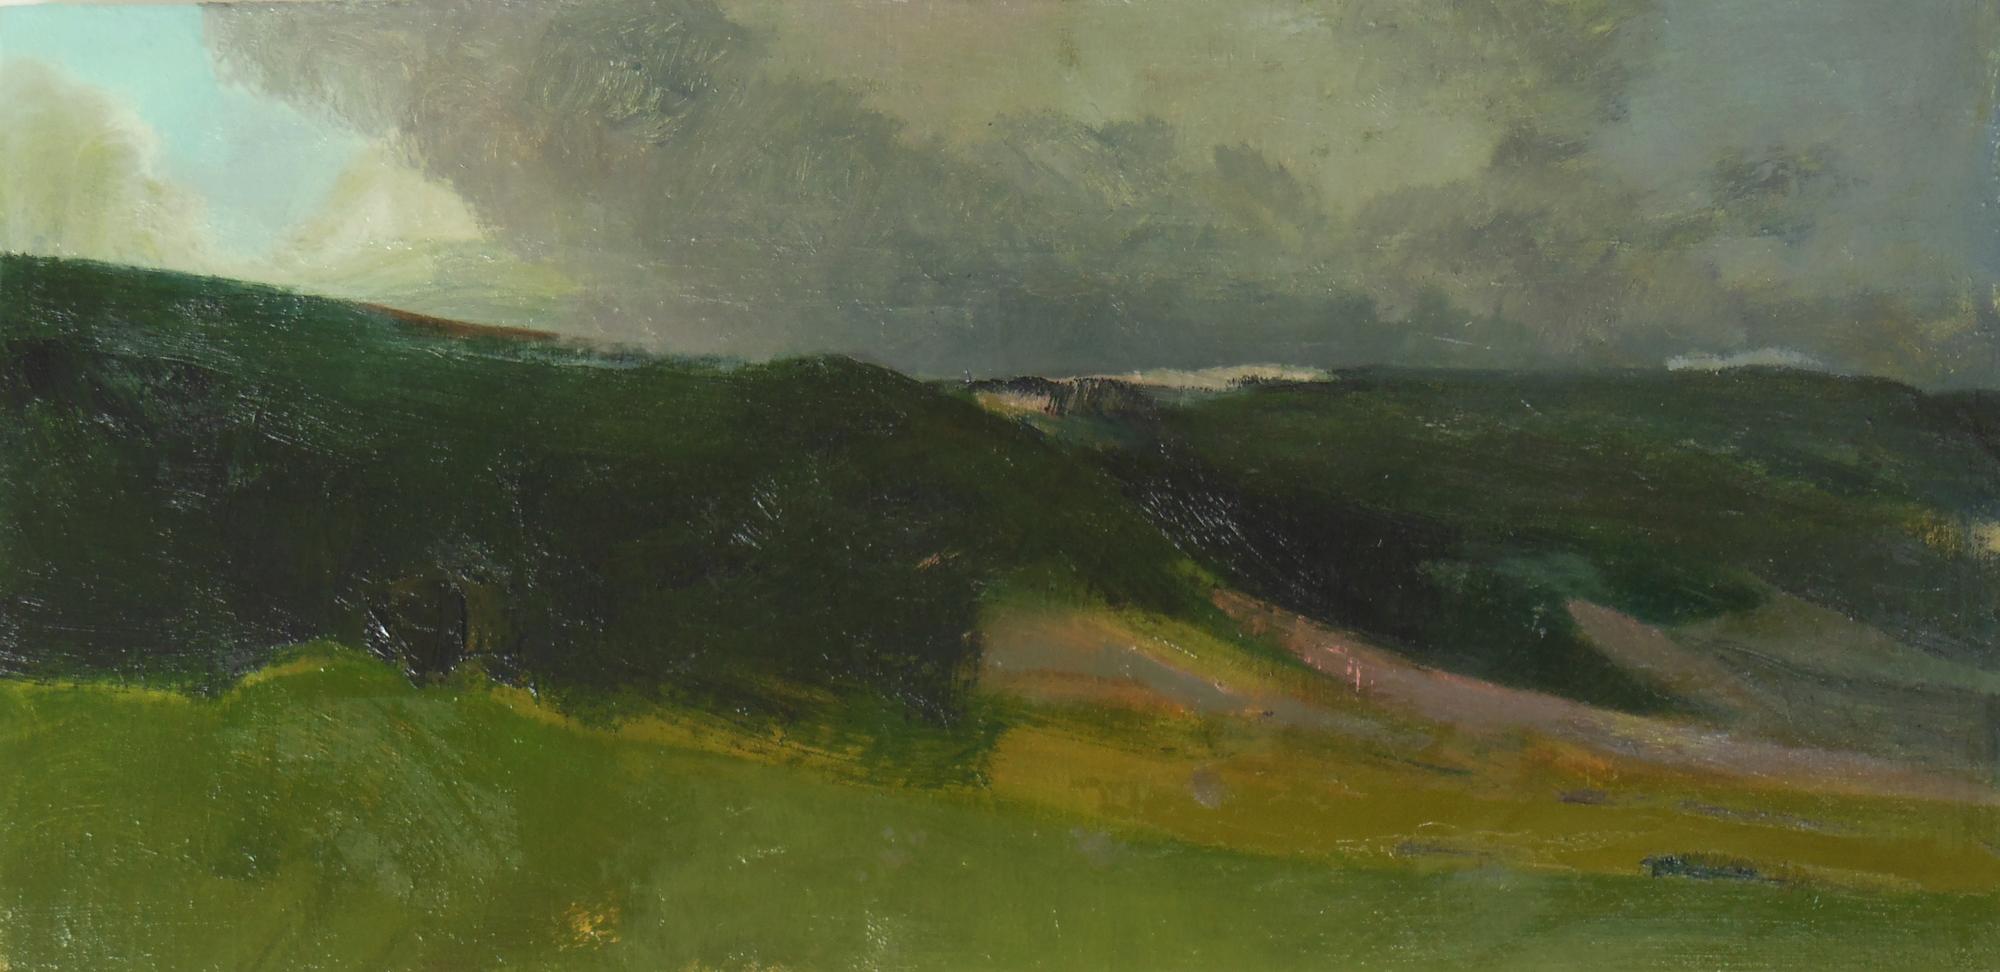 Below Hay Bluff